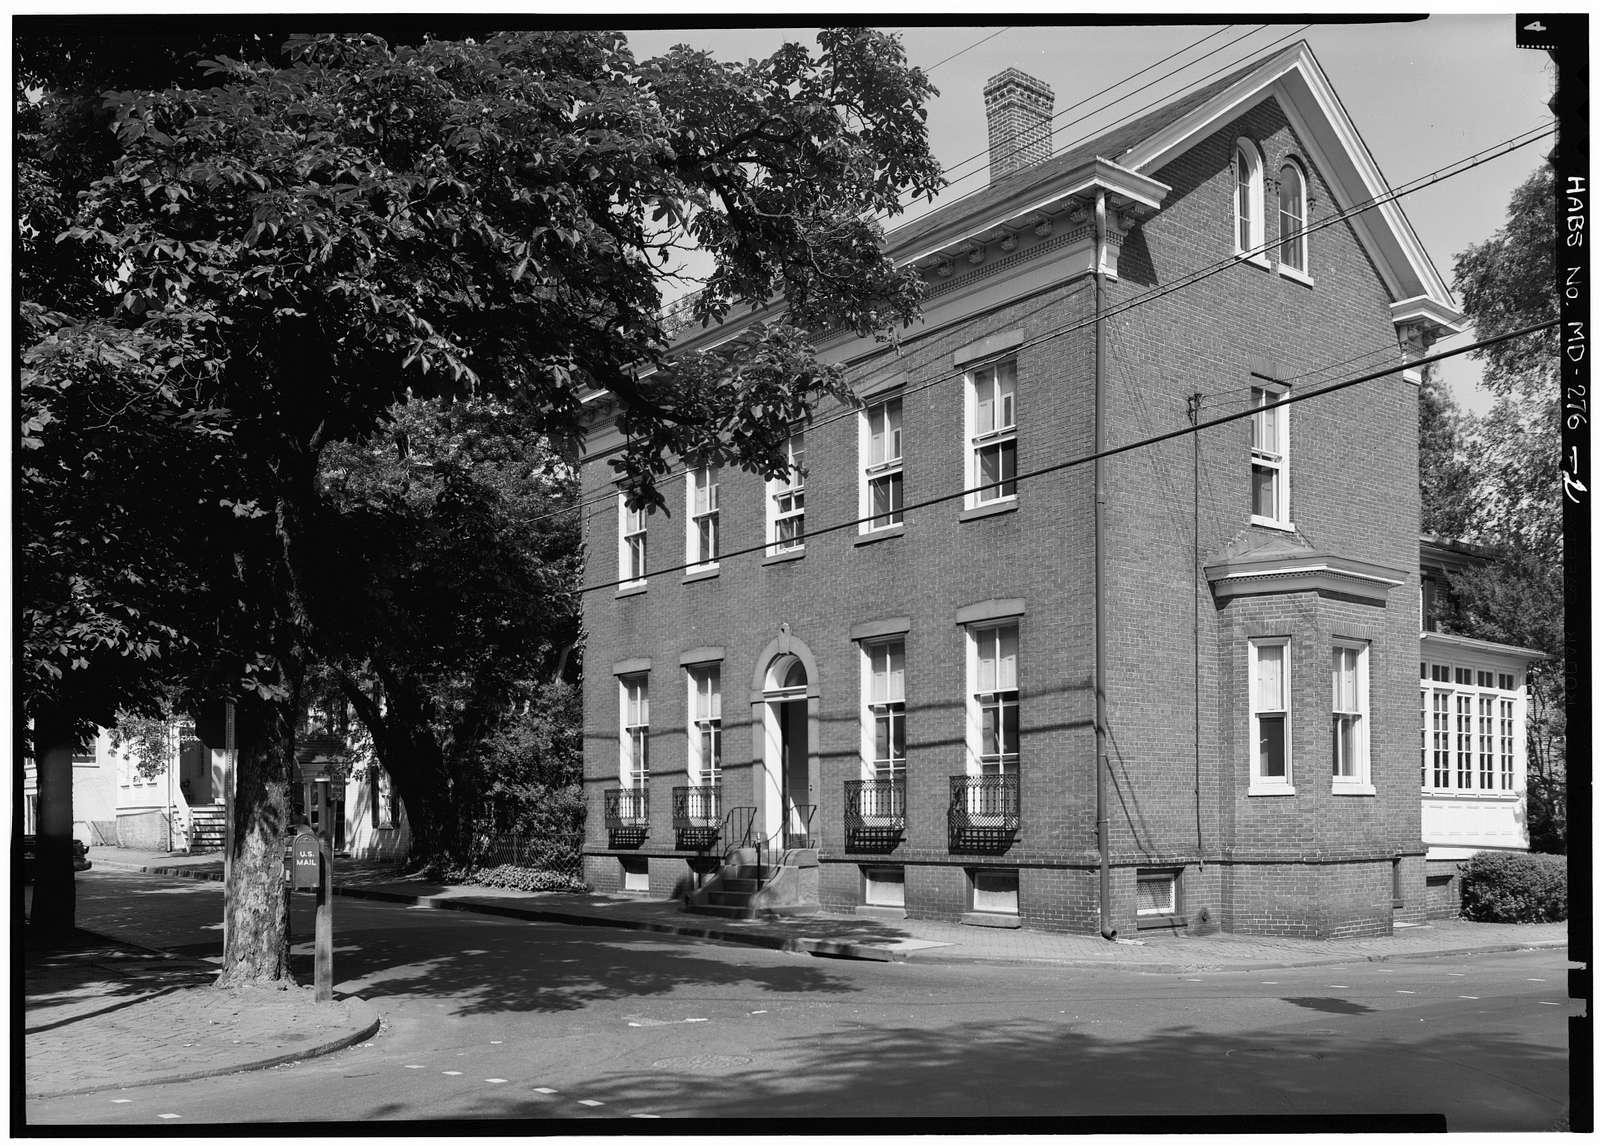 Walton H. Hopkins House, 15 Maryland Avenue & King George Street, Annapolis, Anne Arundel County, MD